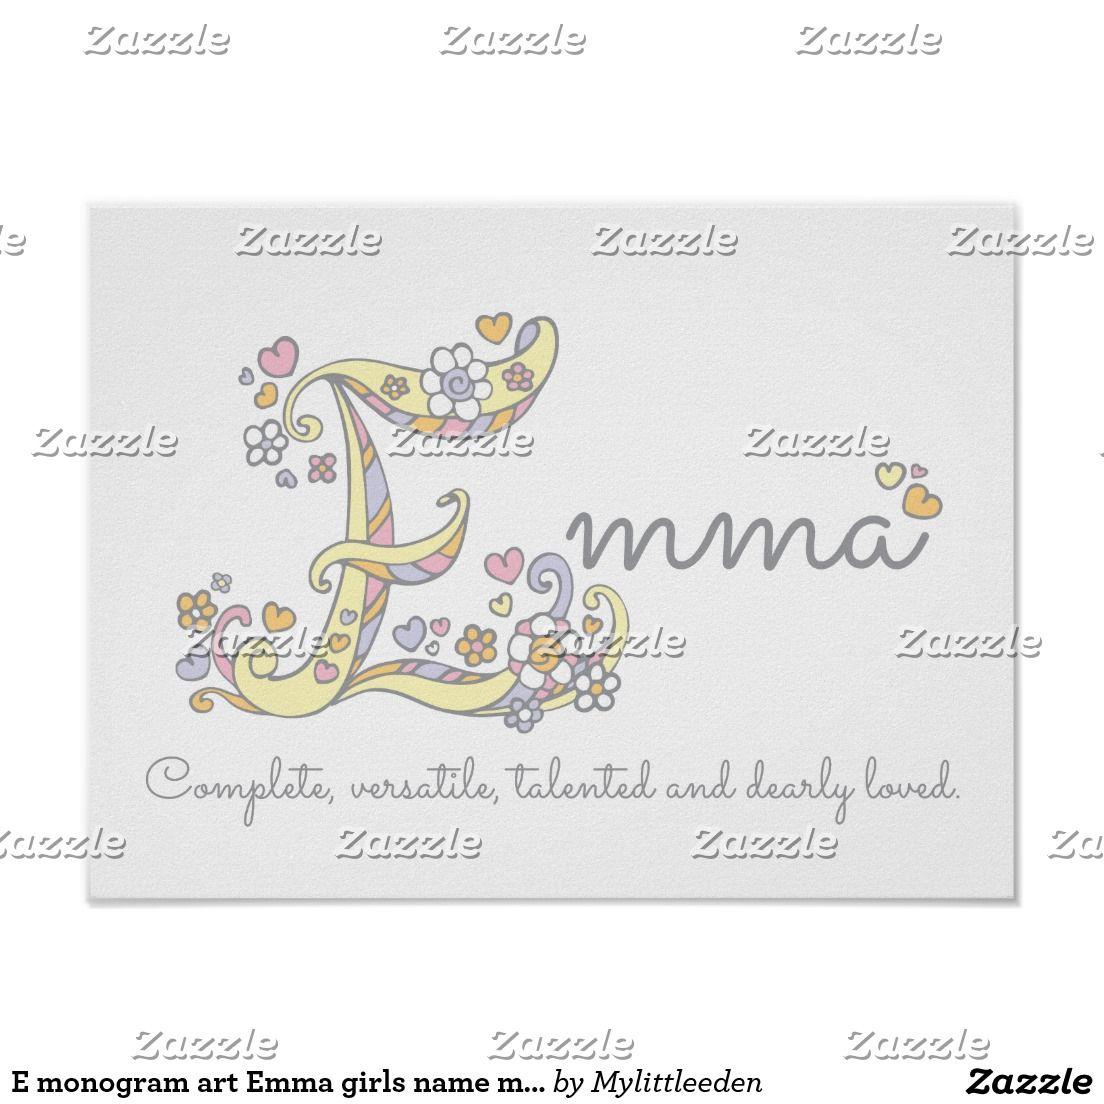 E monogram art emma girls name meaning poster ideal for a e monogram art emma girls name meaning poster ideal for a christening baby shower negle Images